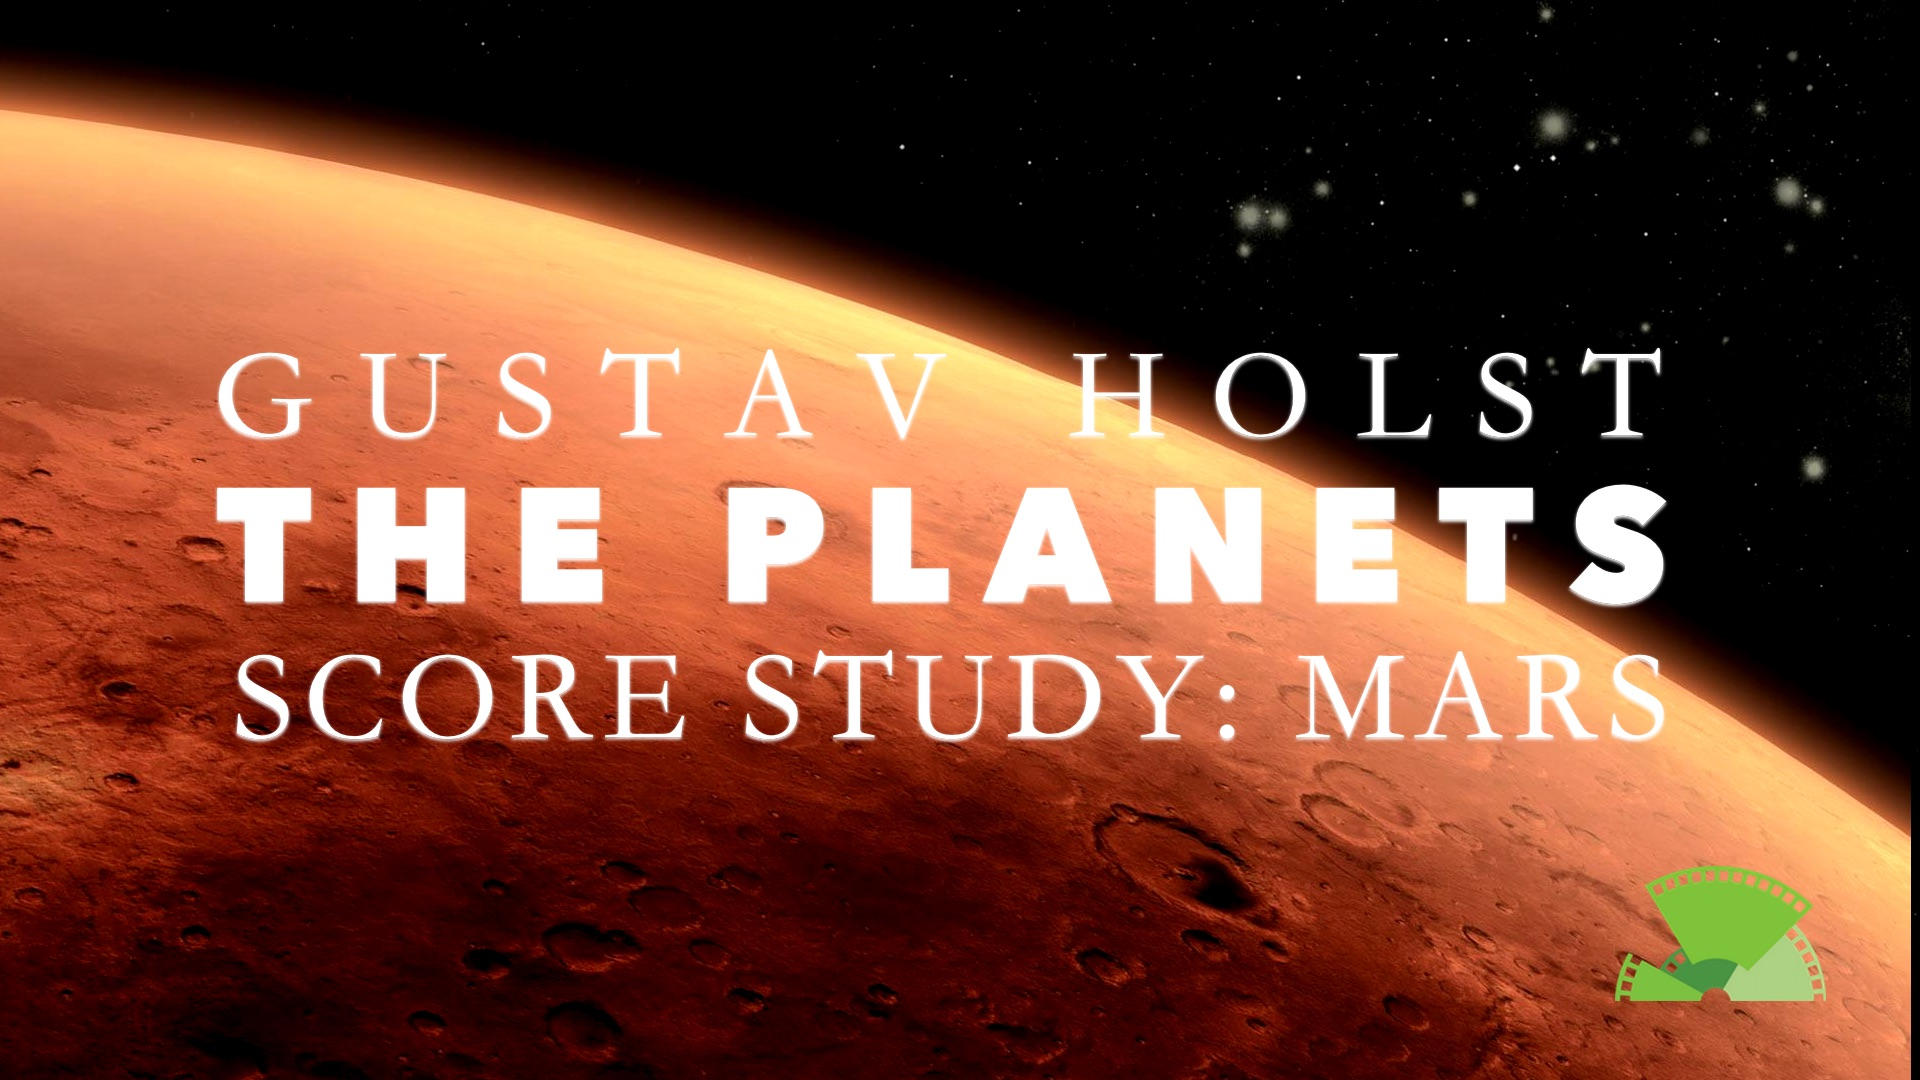 Holst Planets Mars